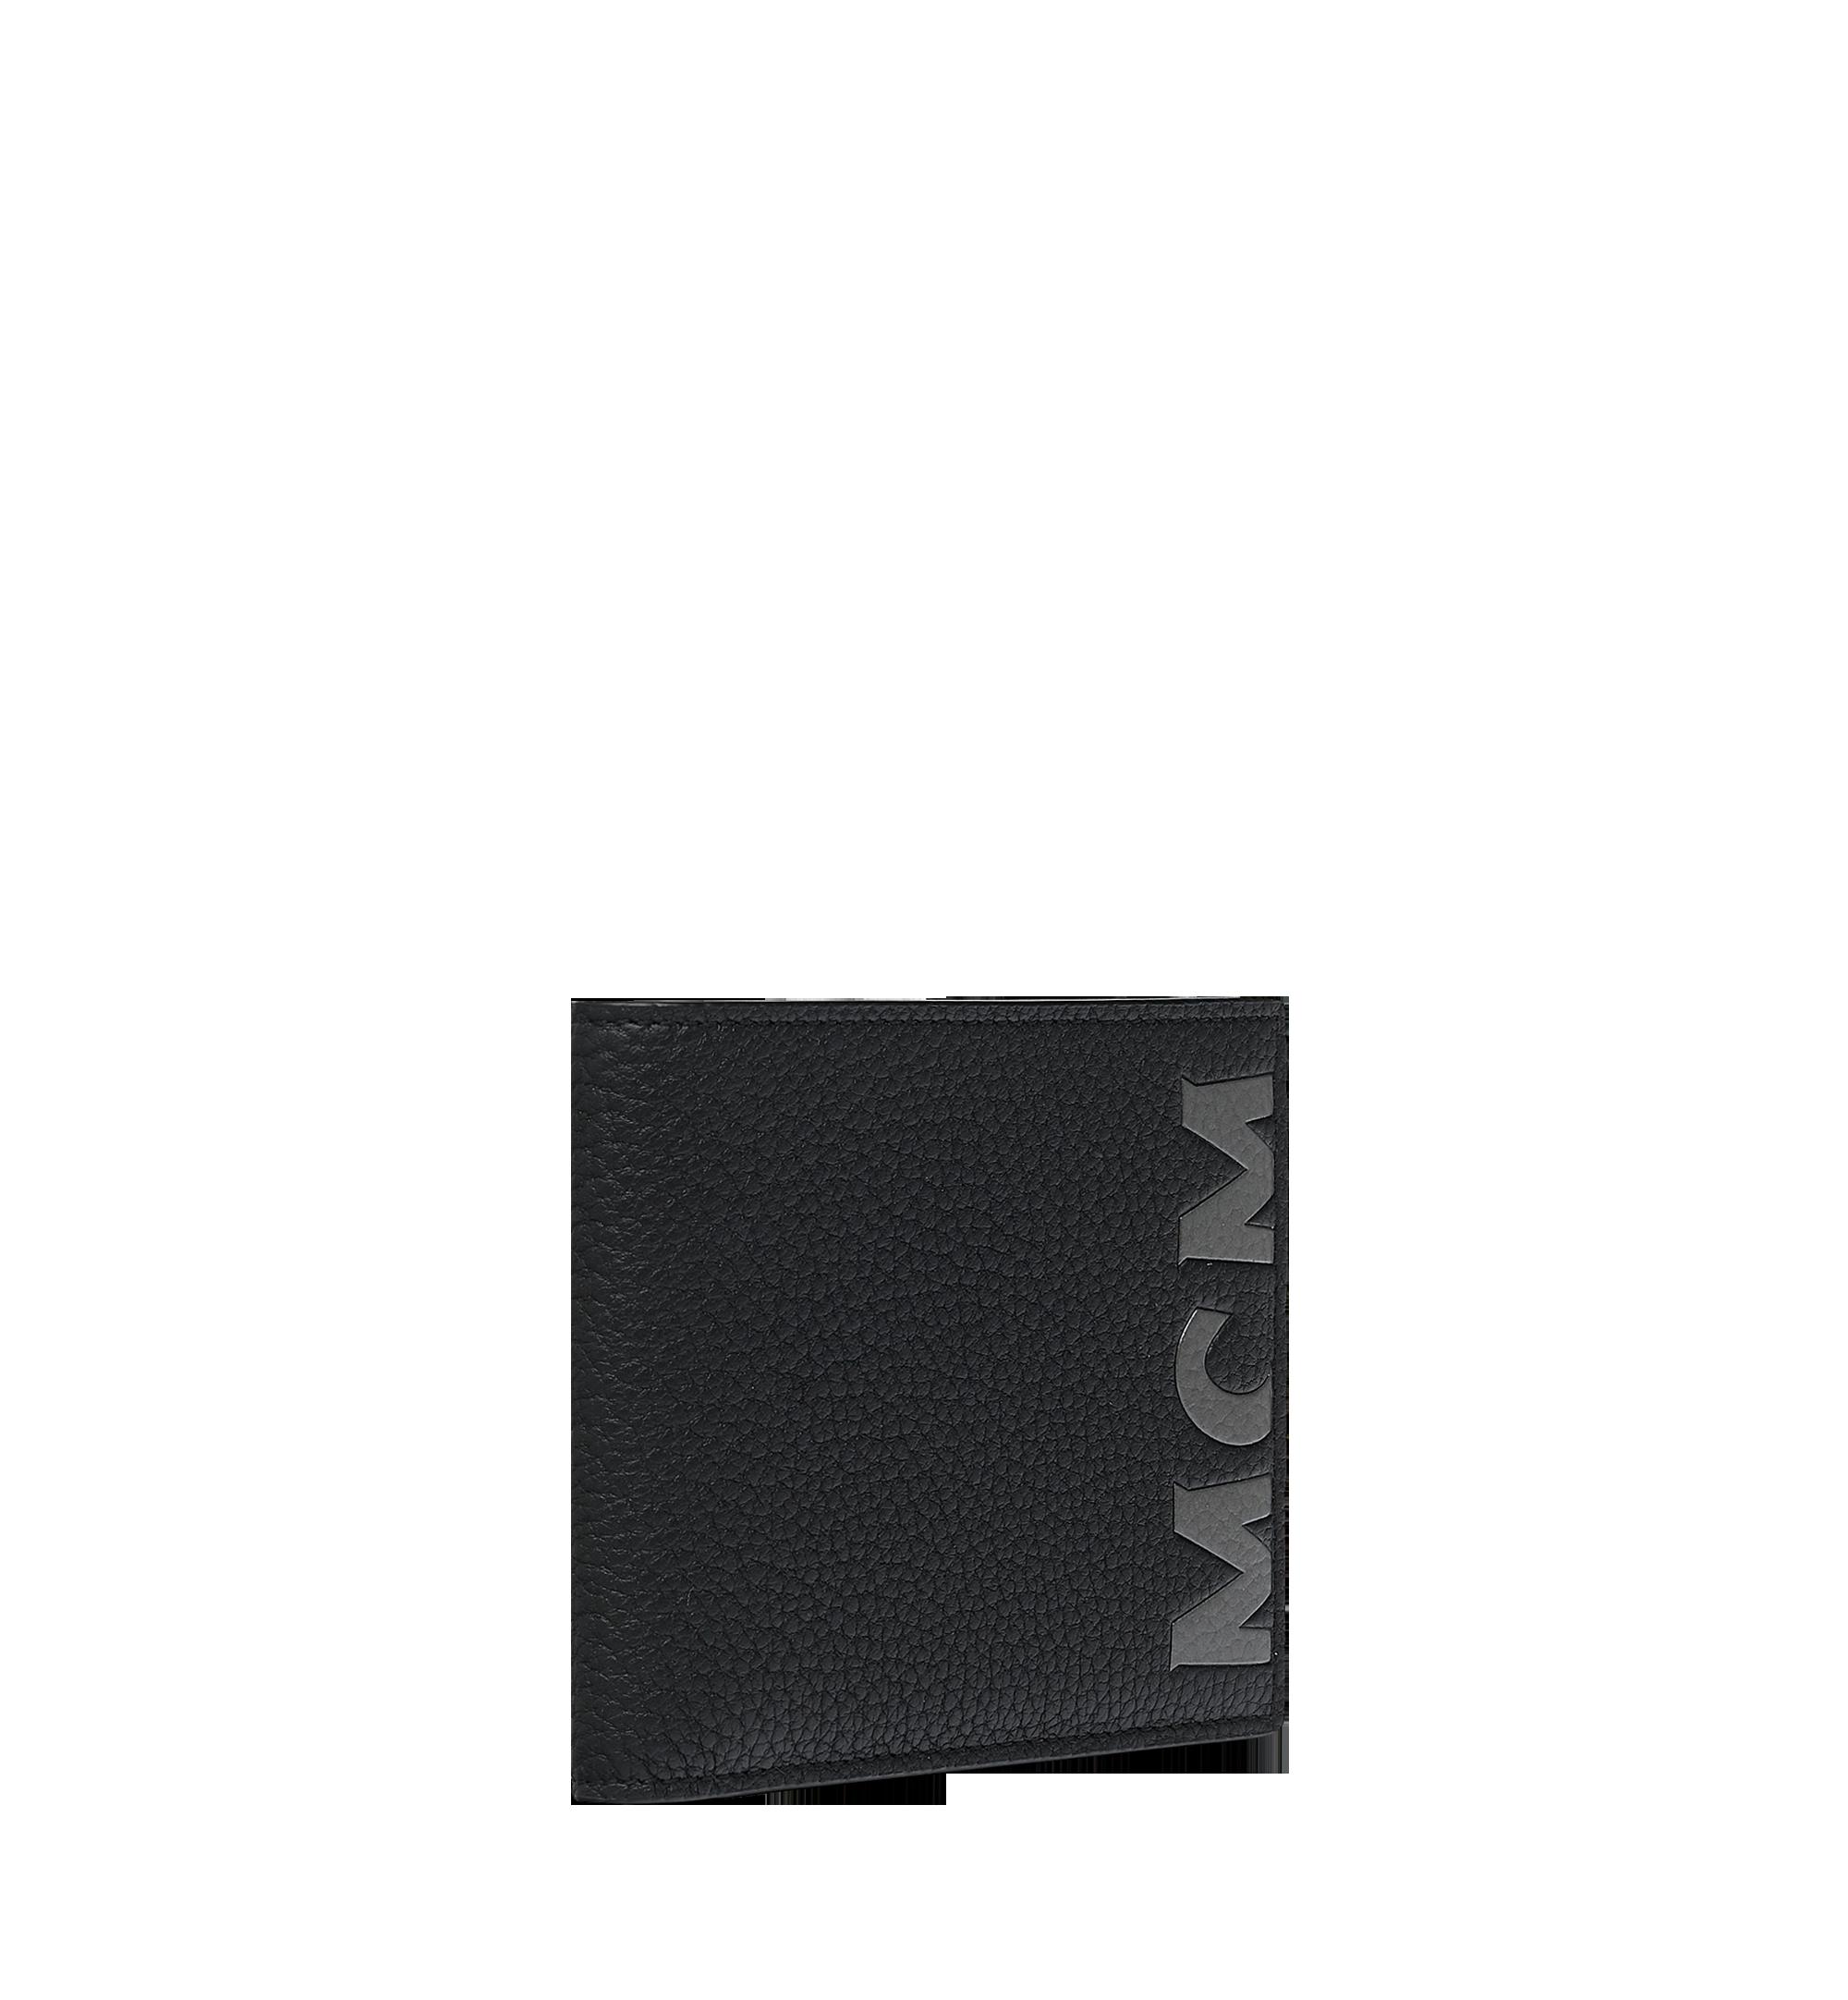 MCM Bifold Wallet in Logo Print Leather Black MXS9SBM03BK001 Alternate View 1